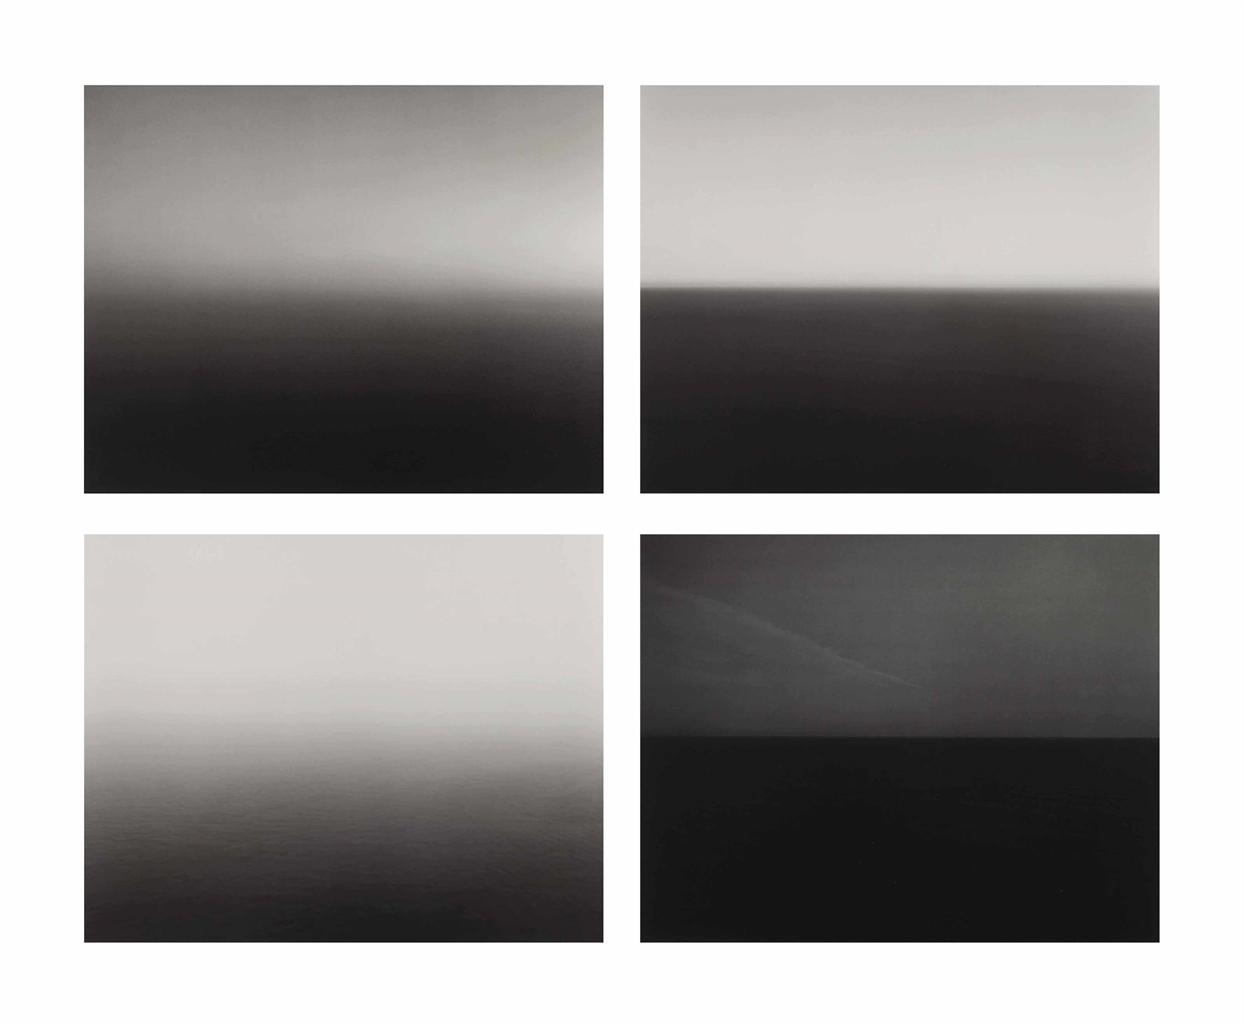 Hiroshi Sugimoto-Time Exposed-1991